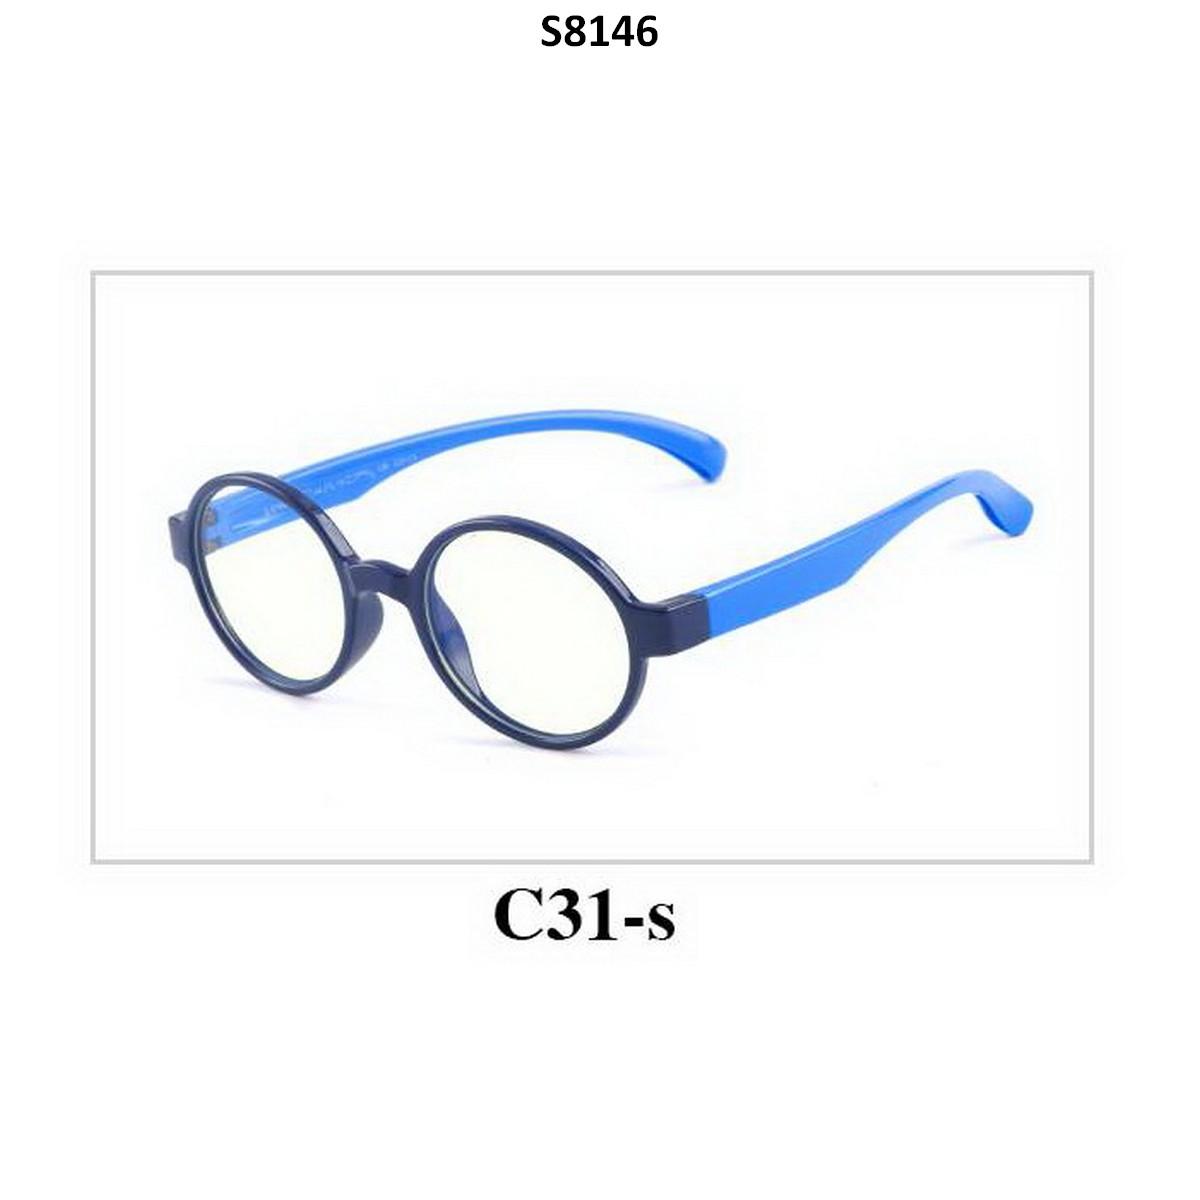 Kids Blue Light Blocker Computer Glasses Anti Blue Ray Eyeglasses S8146C31